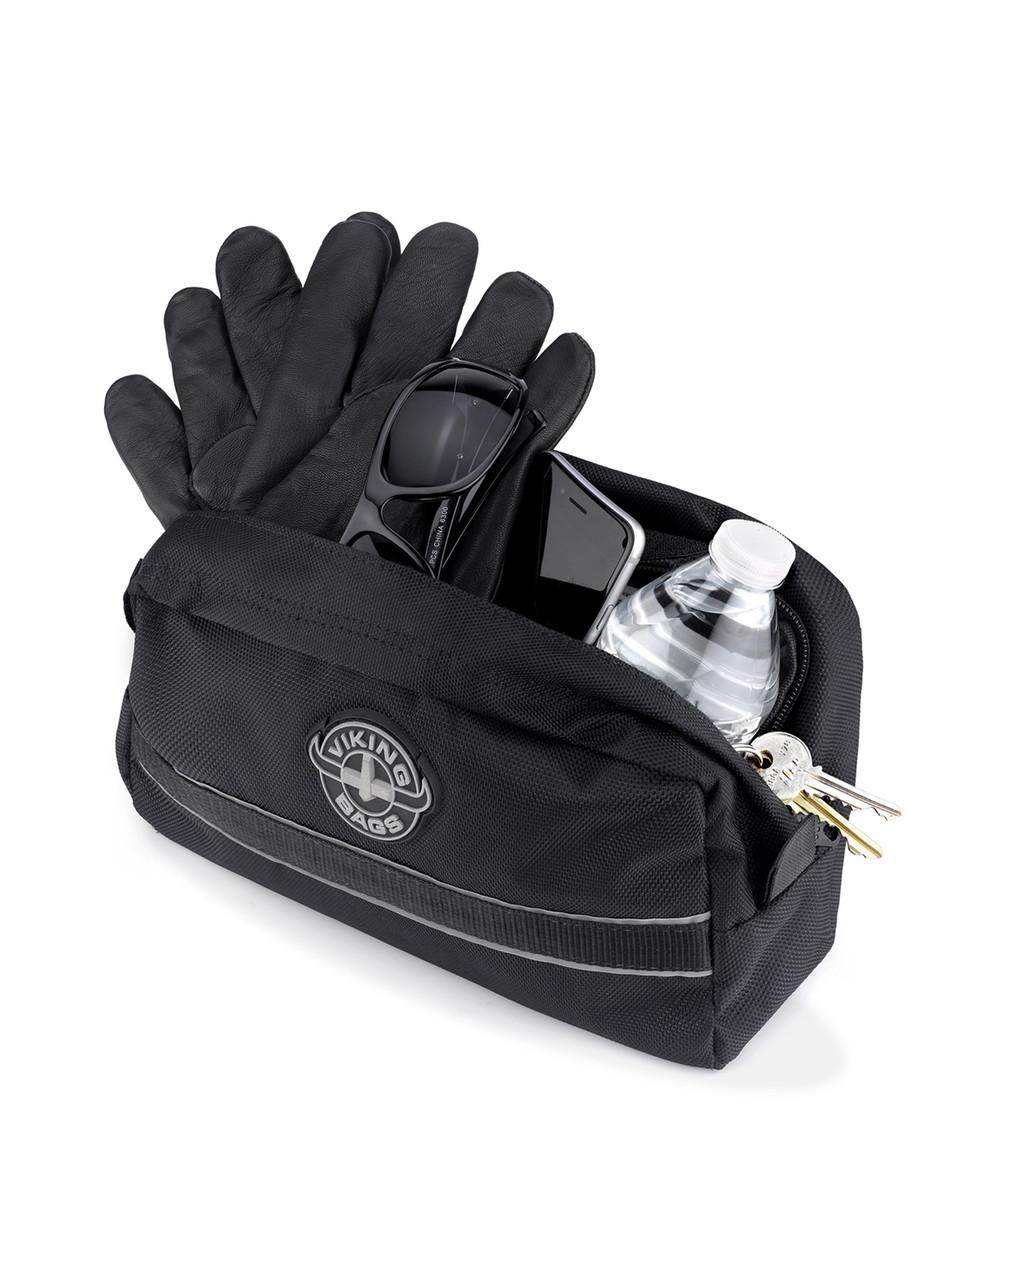 Viking Small Black Dirt Bike/Enduro Handleber Bag Storage View